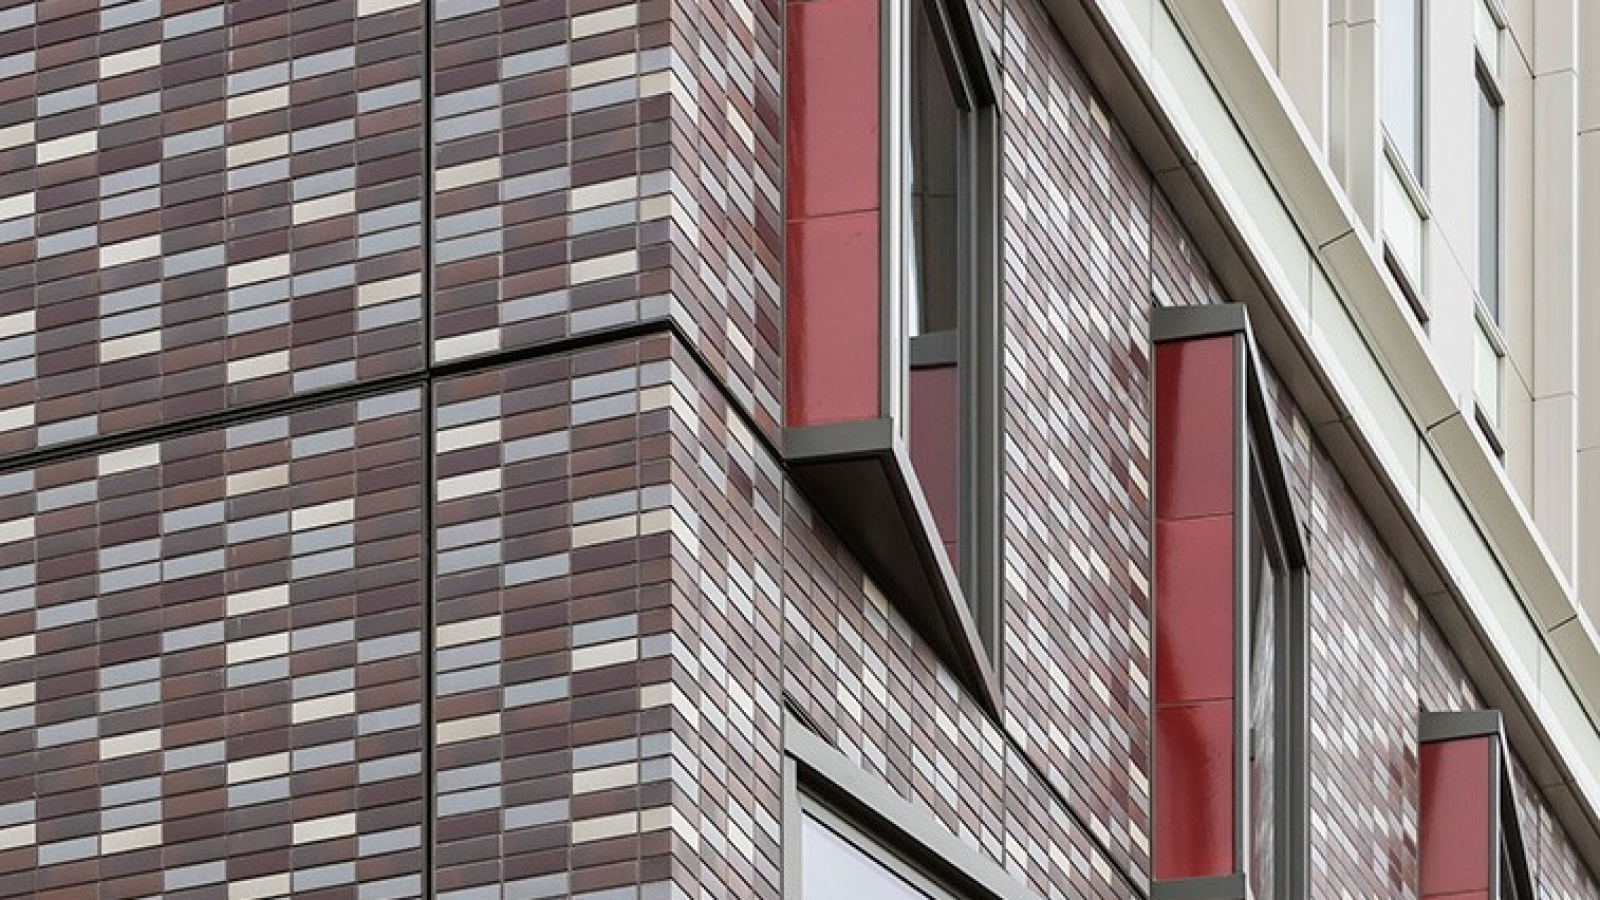 Advantages of the brick cladding2